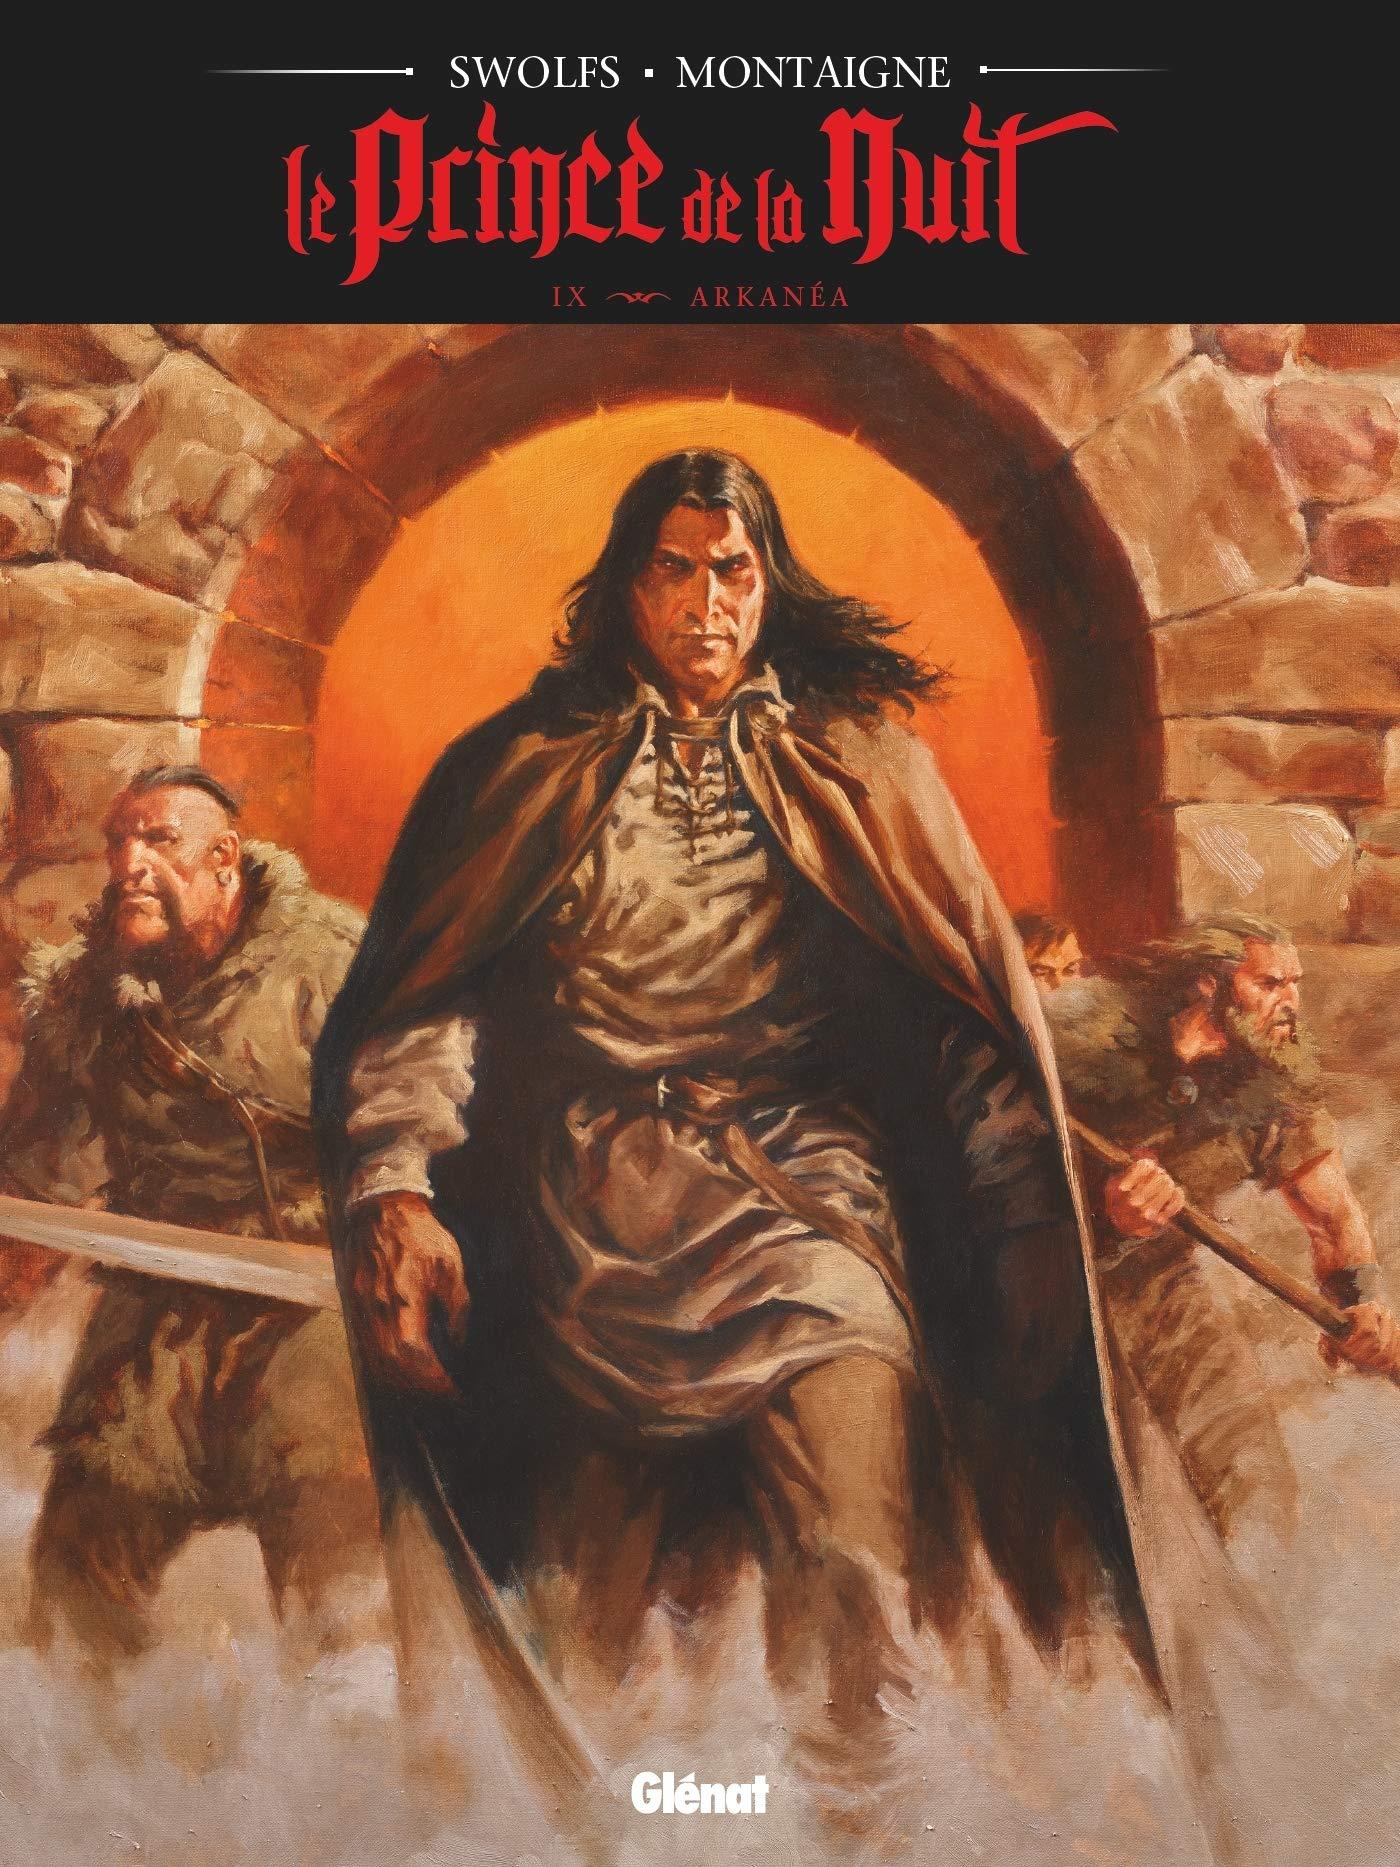 Le prince de la nuit 9 - Arkanéa